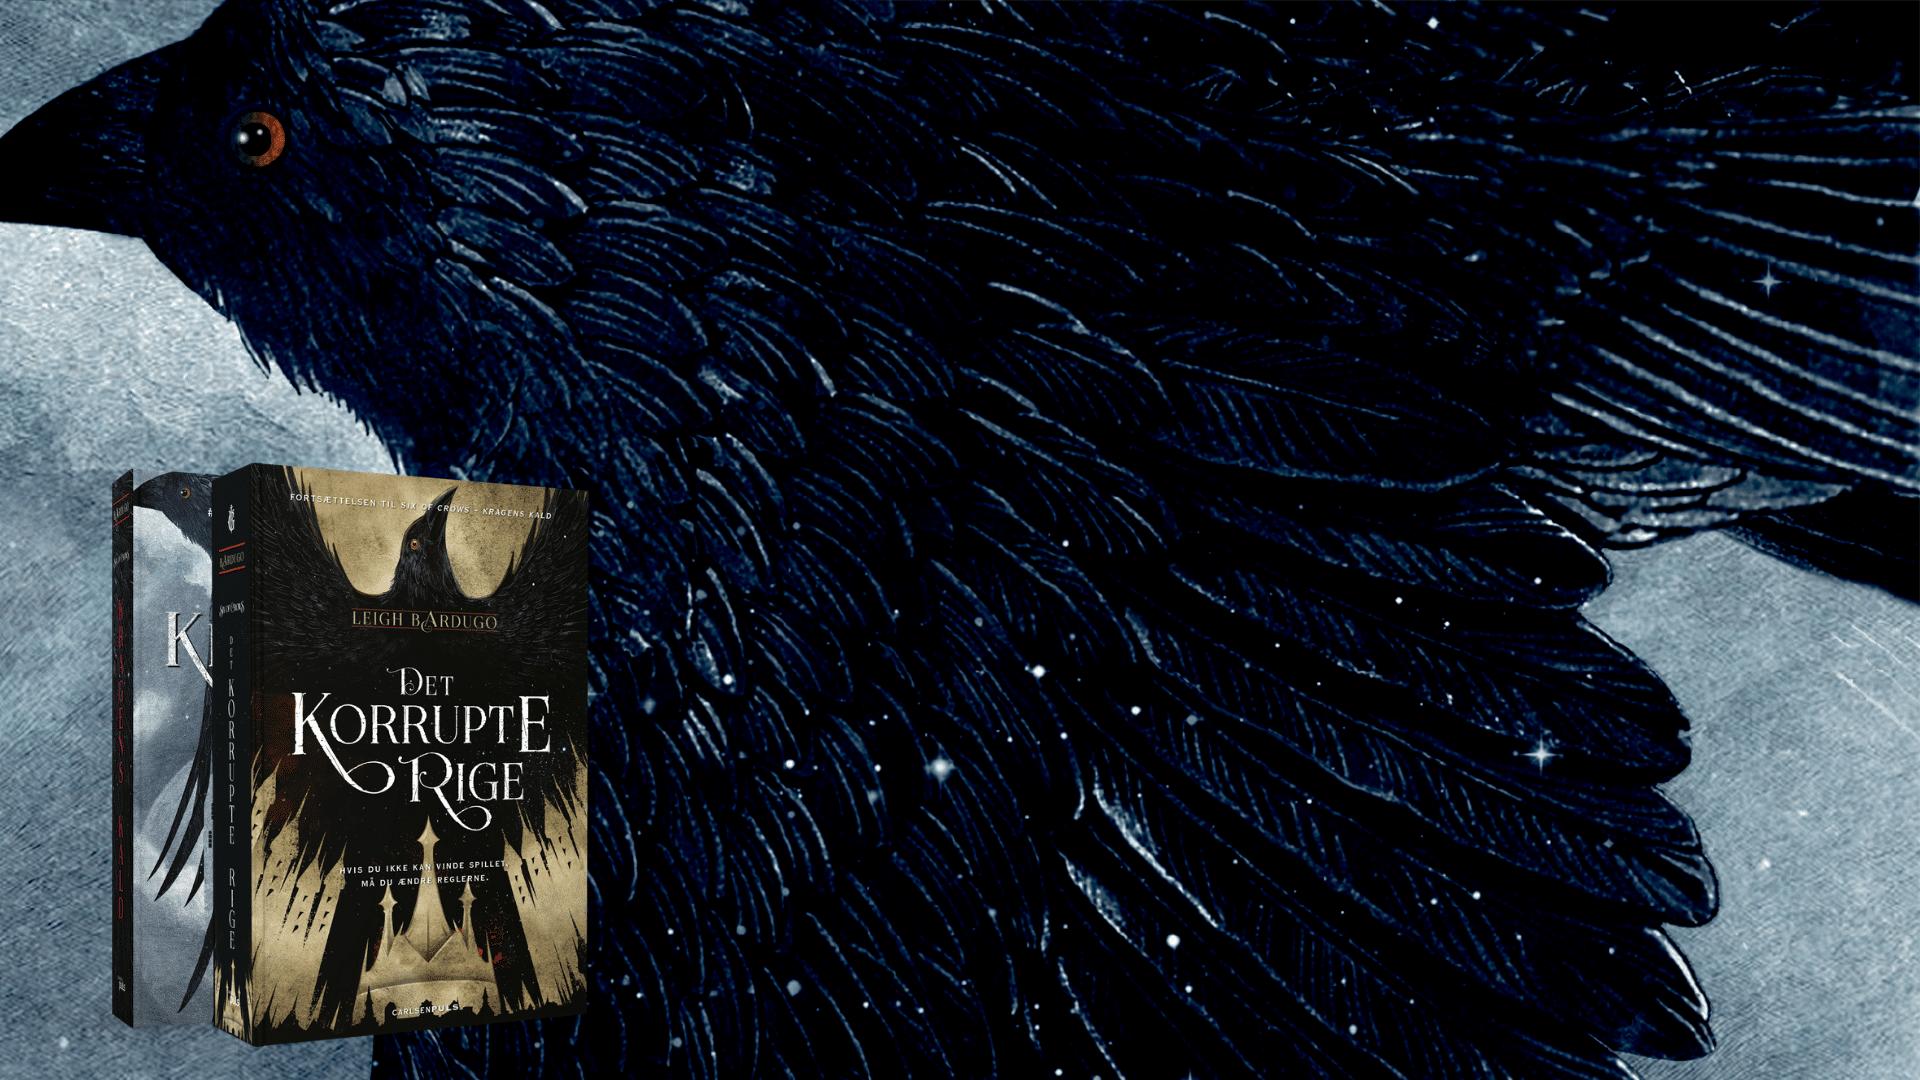 King of Scars, Leigh bardugo, ya, young adult, fantasy six of crows, det korrupte rige, kragens kald